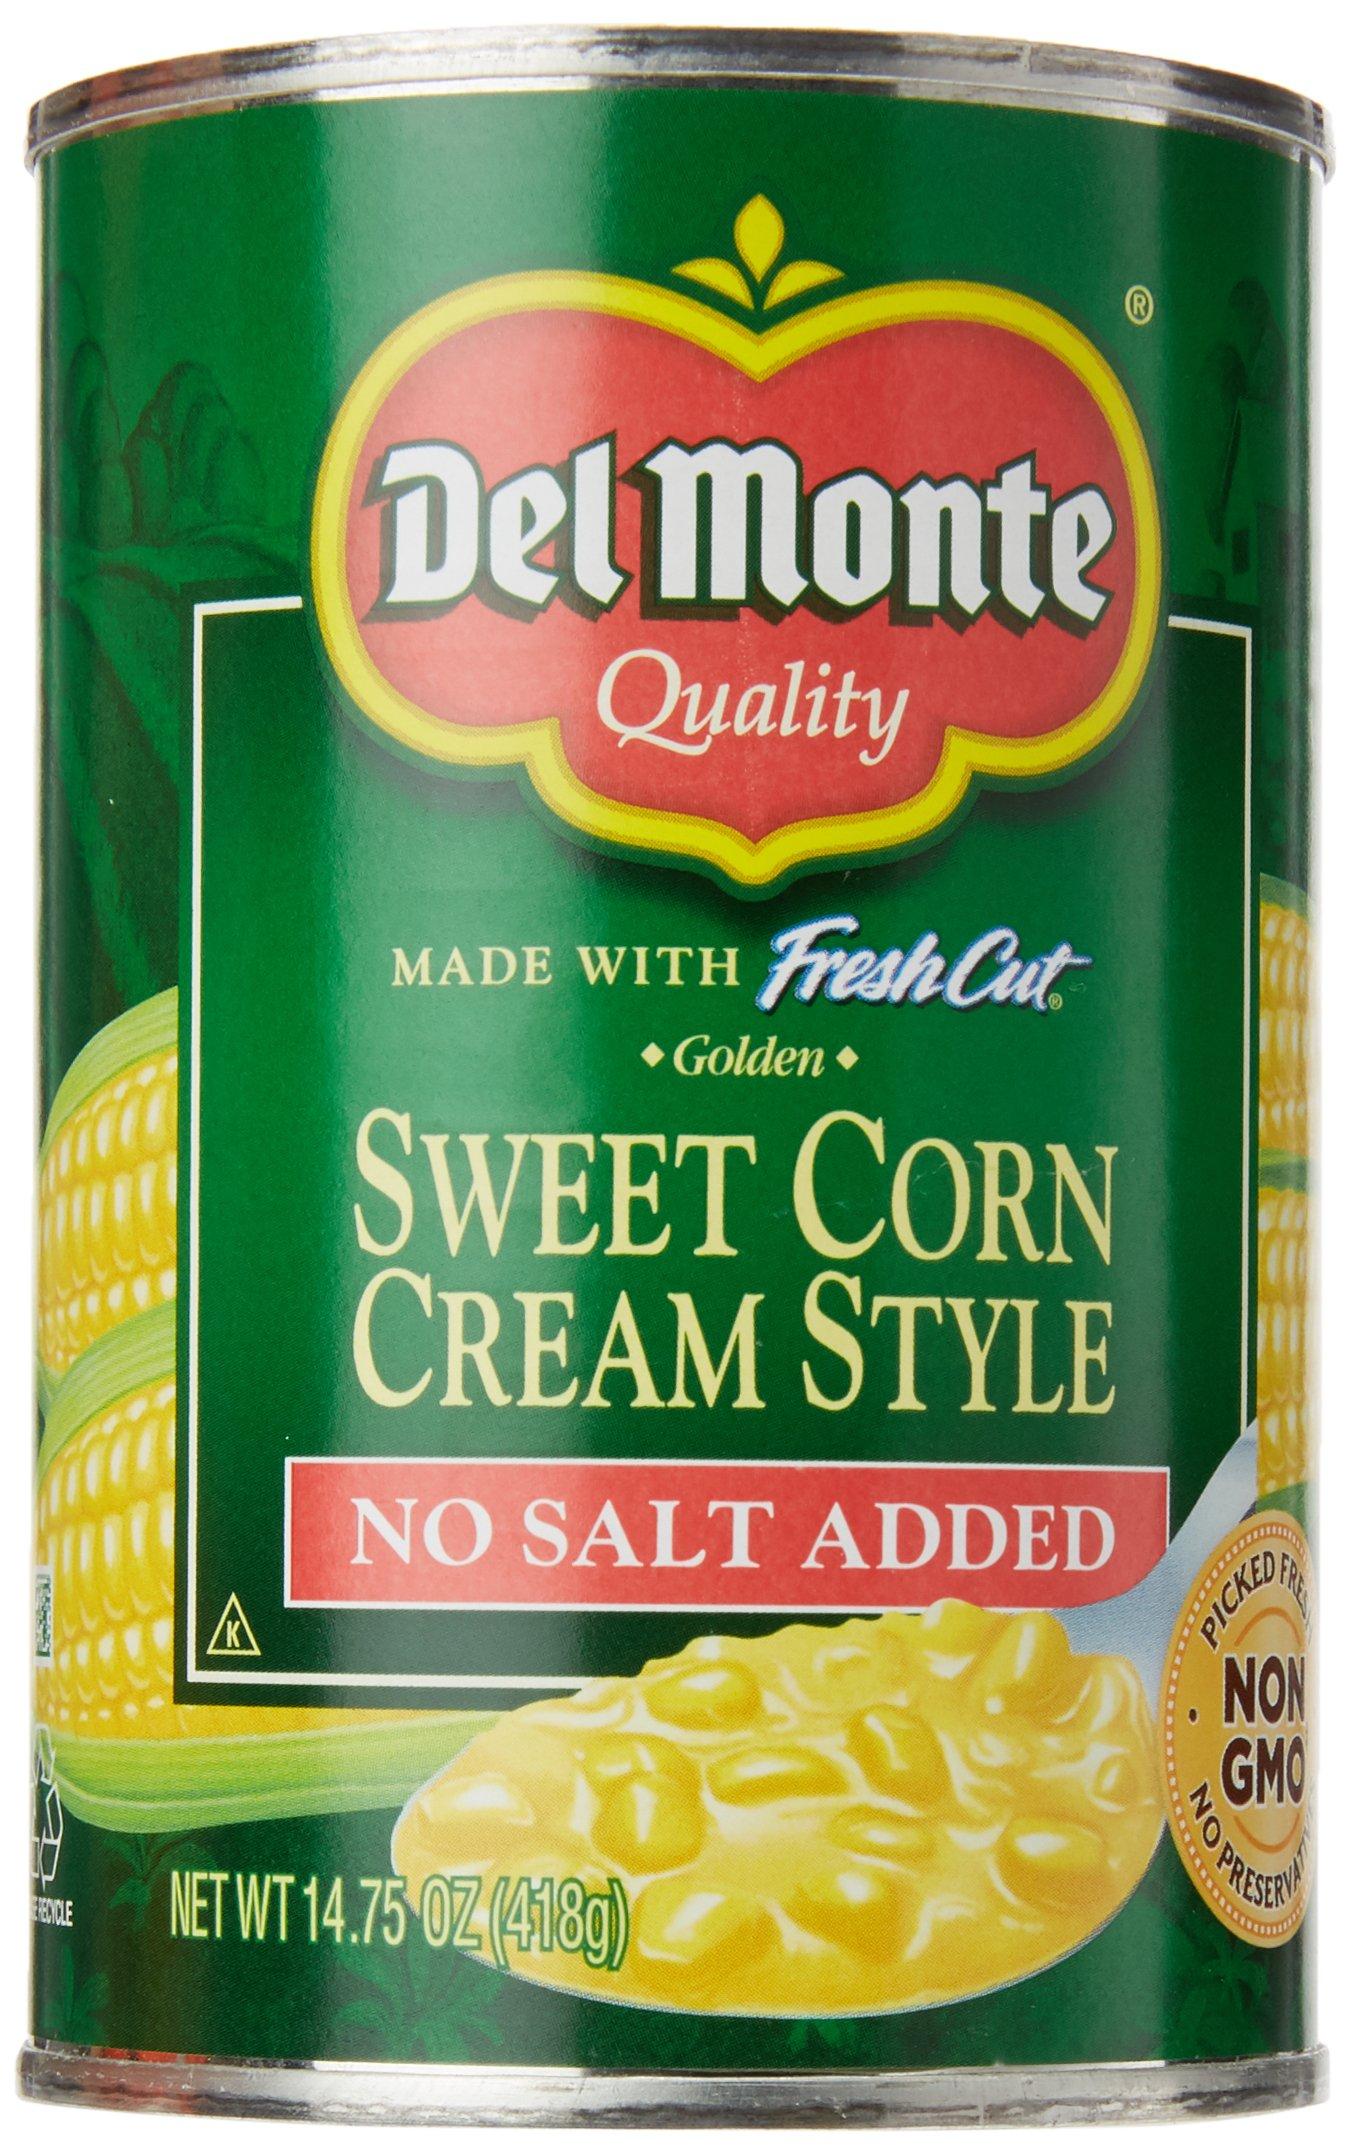 Del Monte Cream Style Sweet Corn No Salt Added, 14.75 oz